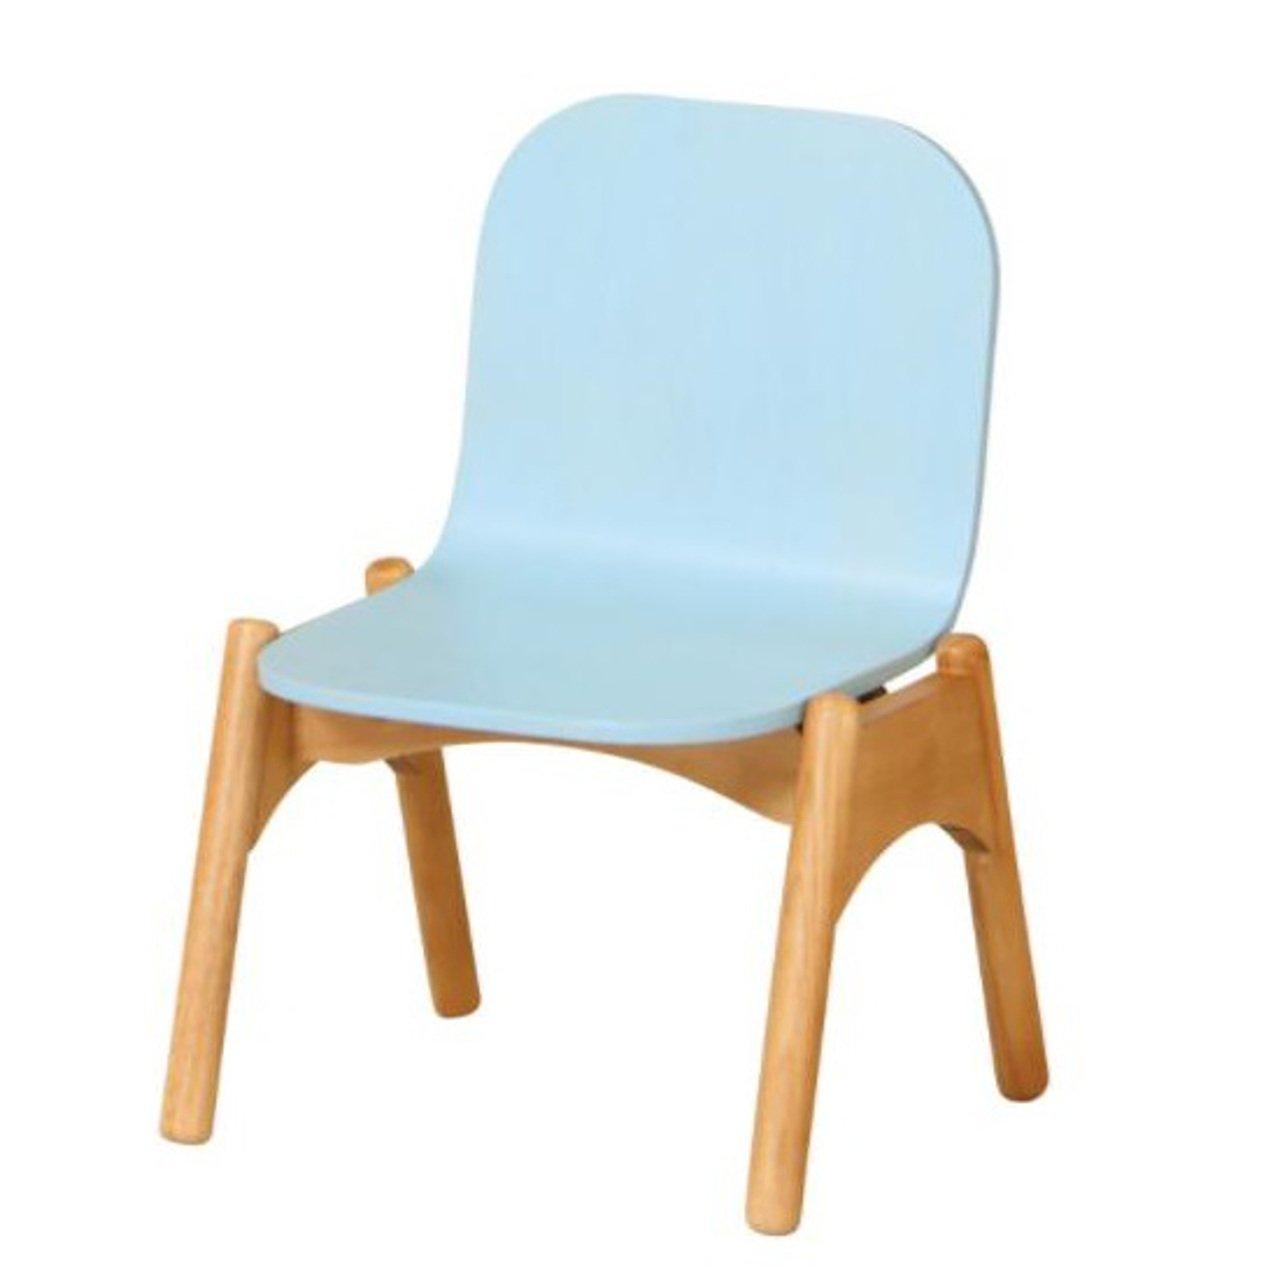 AHEART 天然木 キッズチェア 子供用 チェア 木製 SI 309 ブルー B0792MH9B9 ブルー ブルー